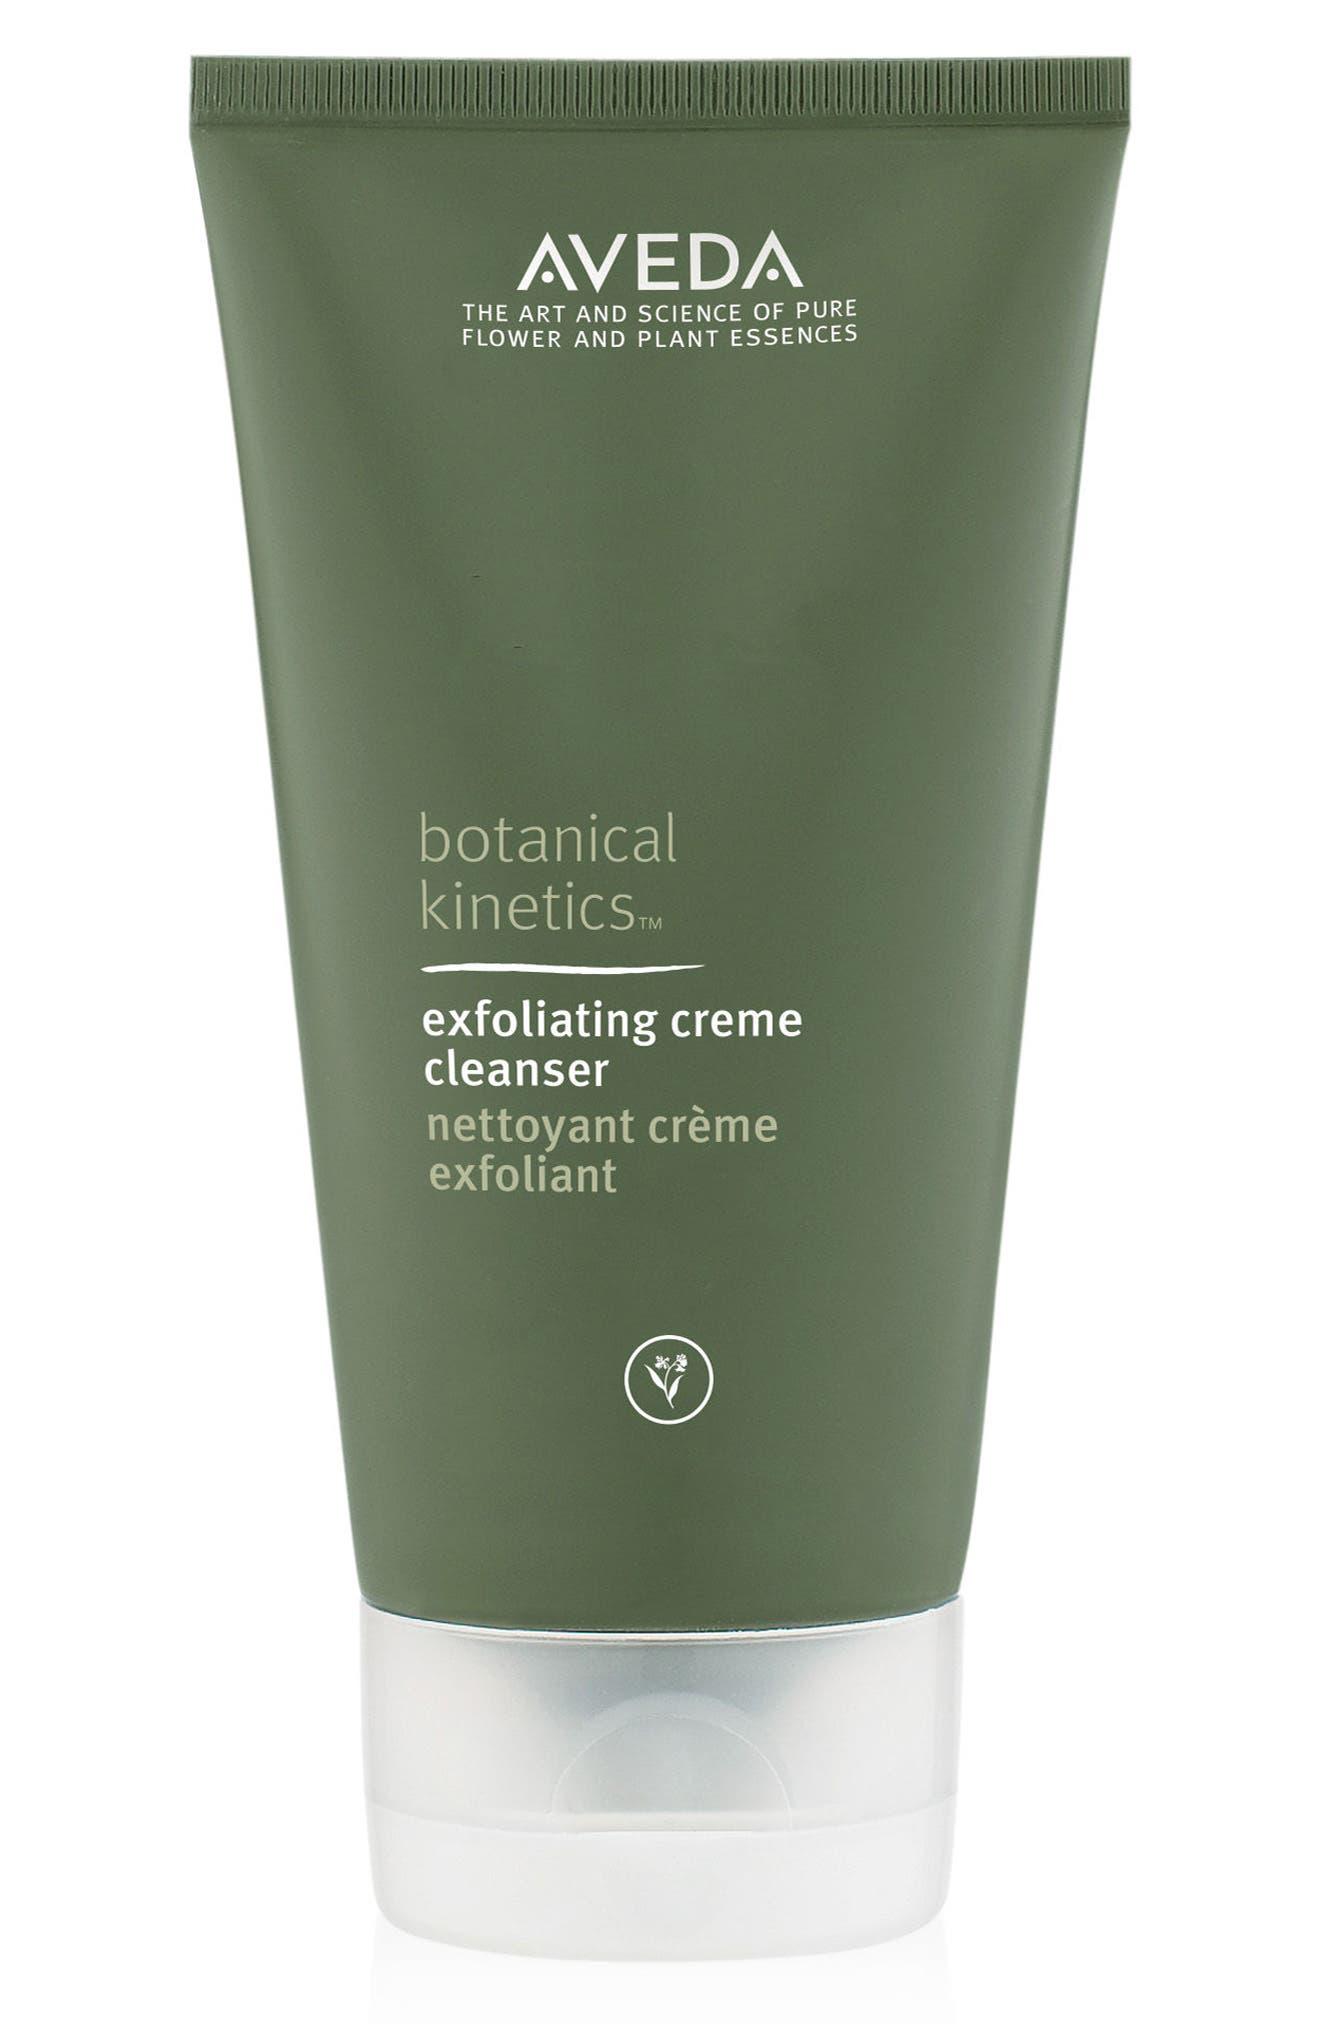 Botanical Kinetics(TM) Exfoliating Creme Cleanser